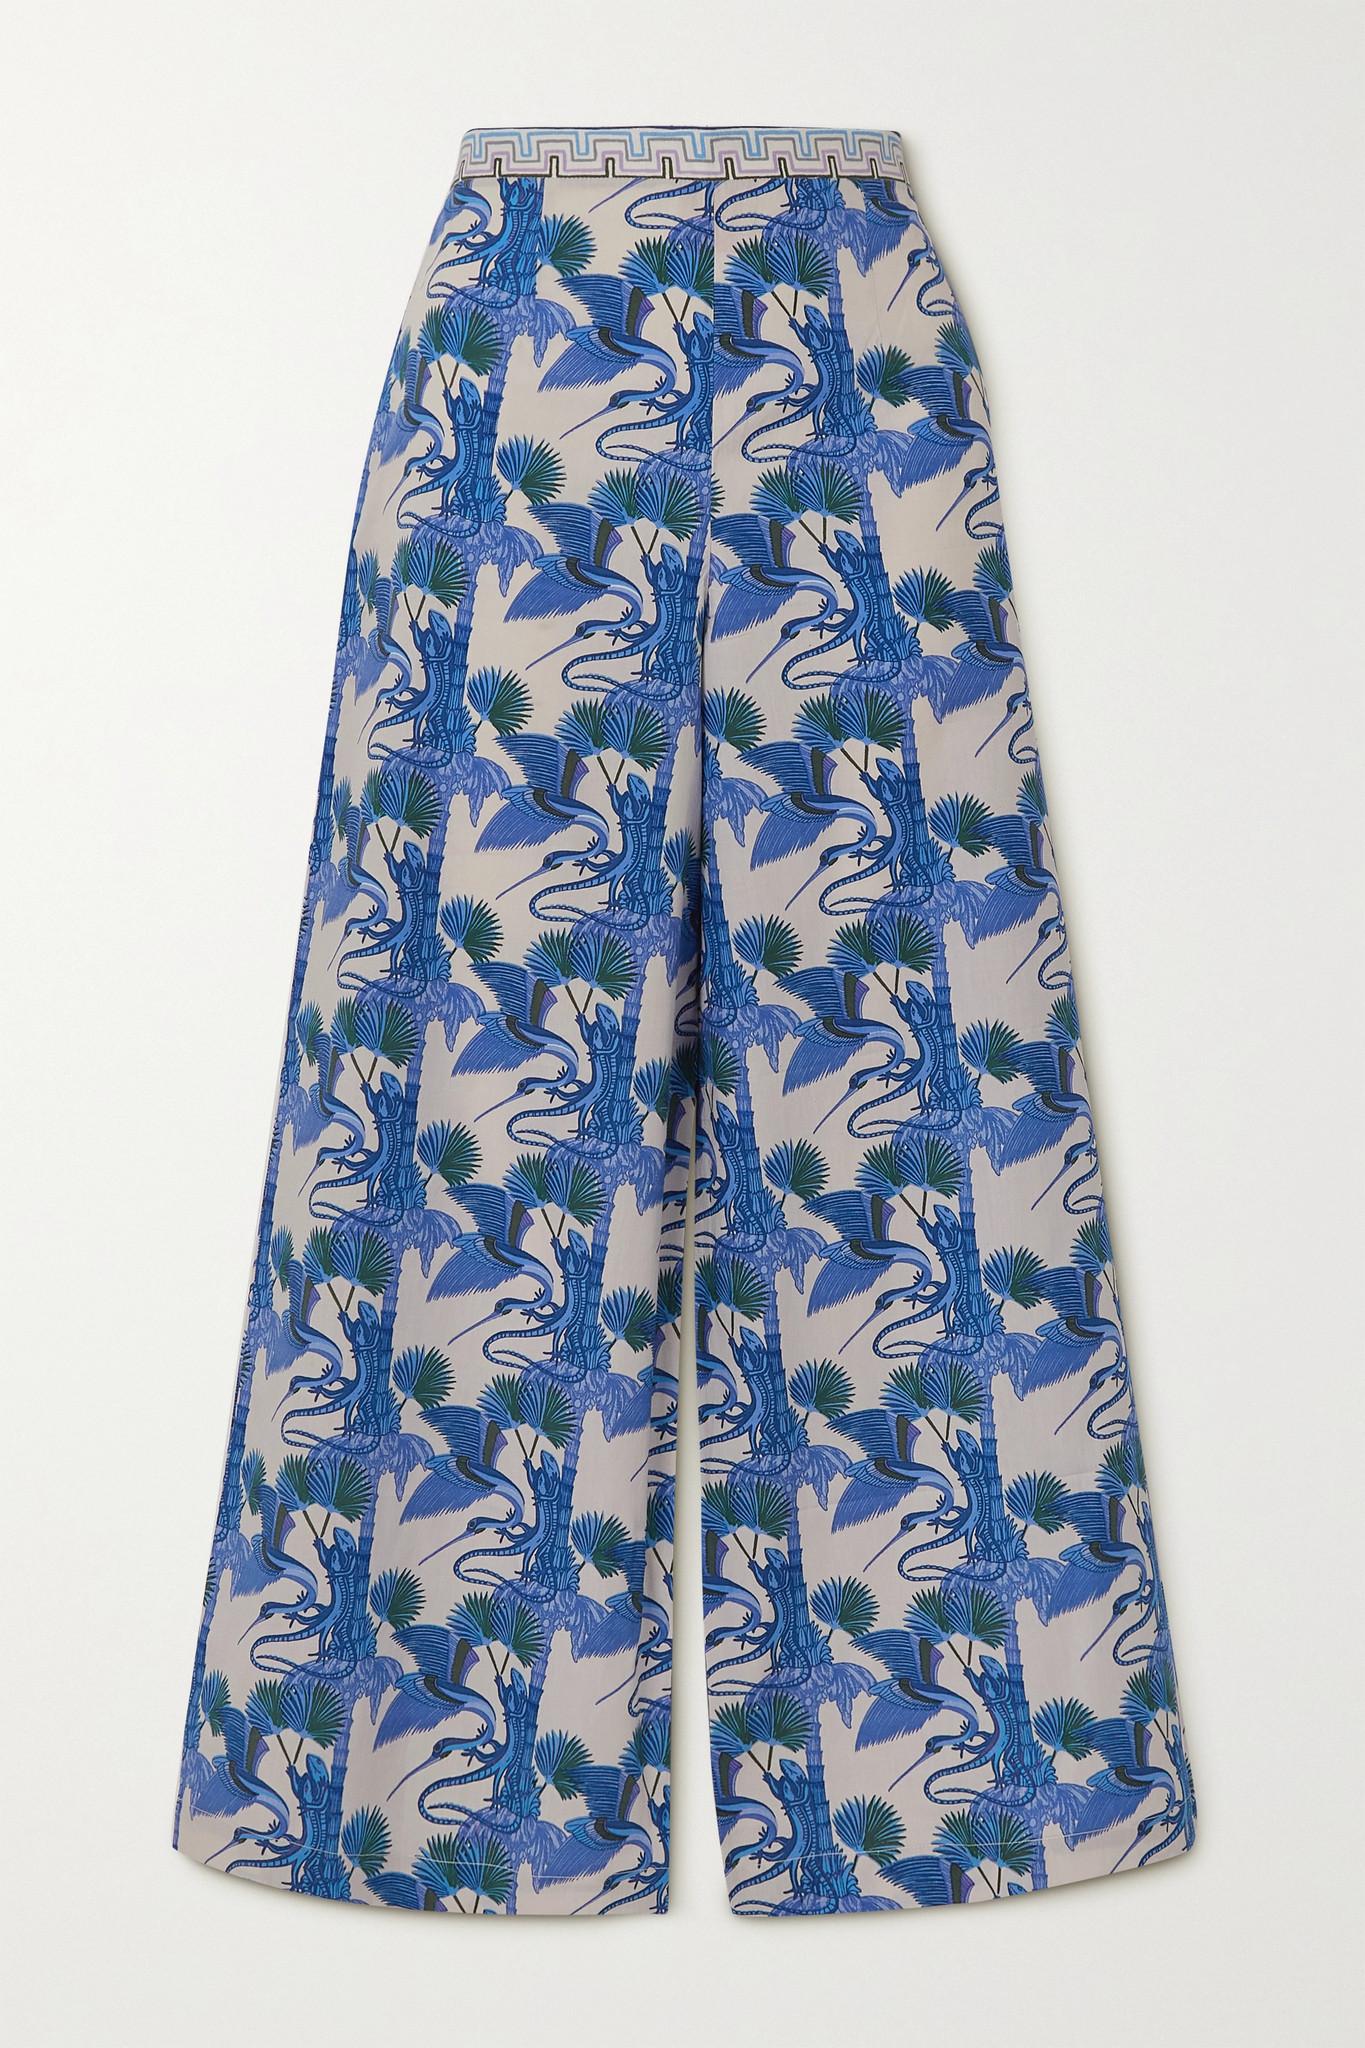 LE SIRENUSE POSITANO - Natalie Love Story Printed Cotton-poplin Wide-leg Pants - Blue - IT44